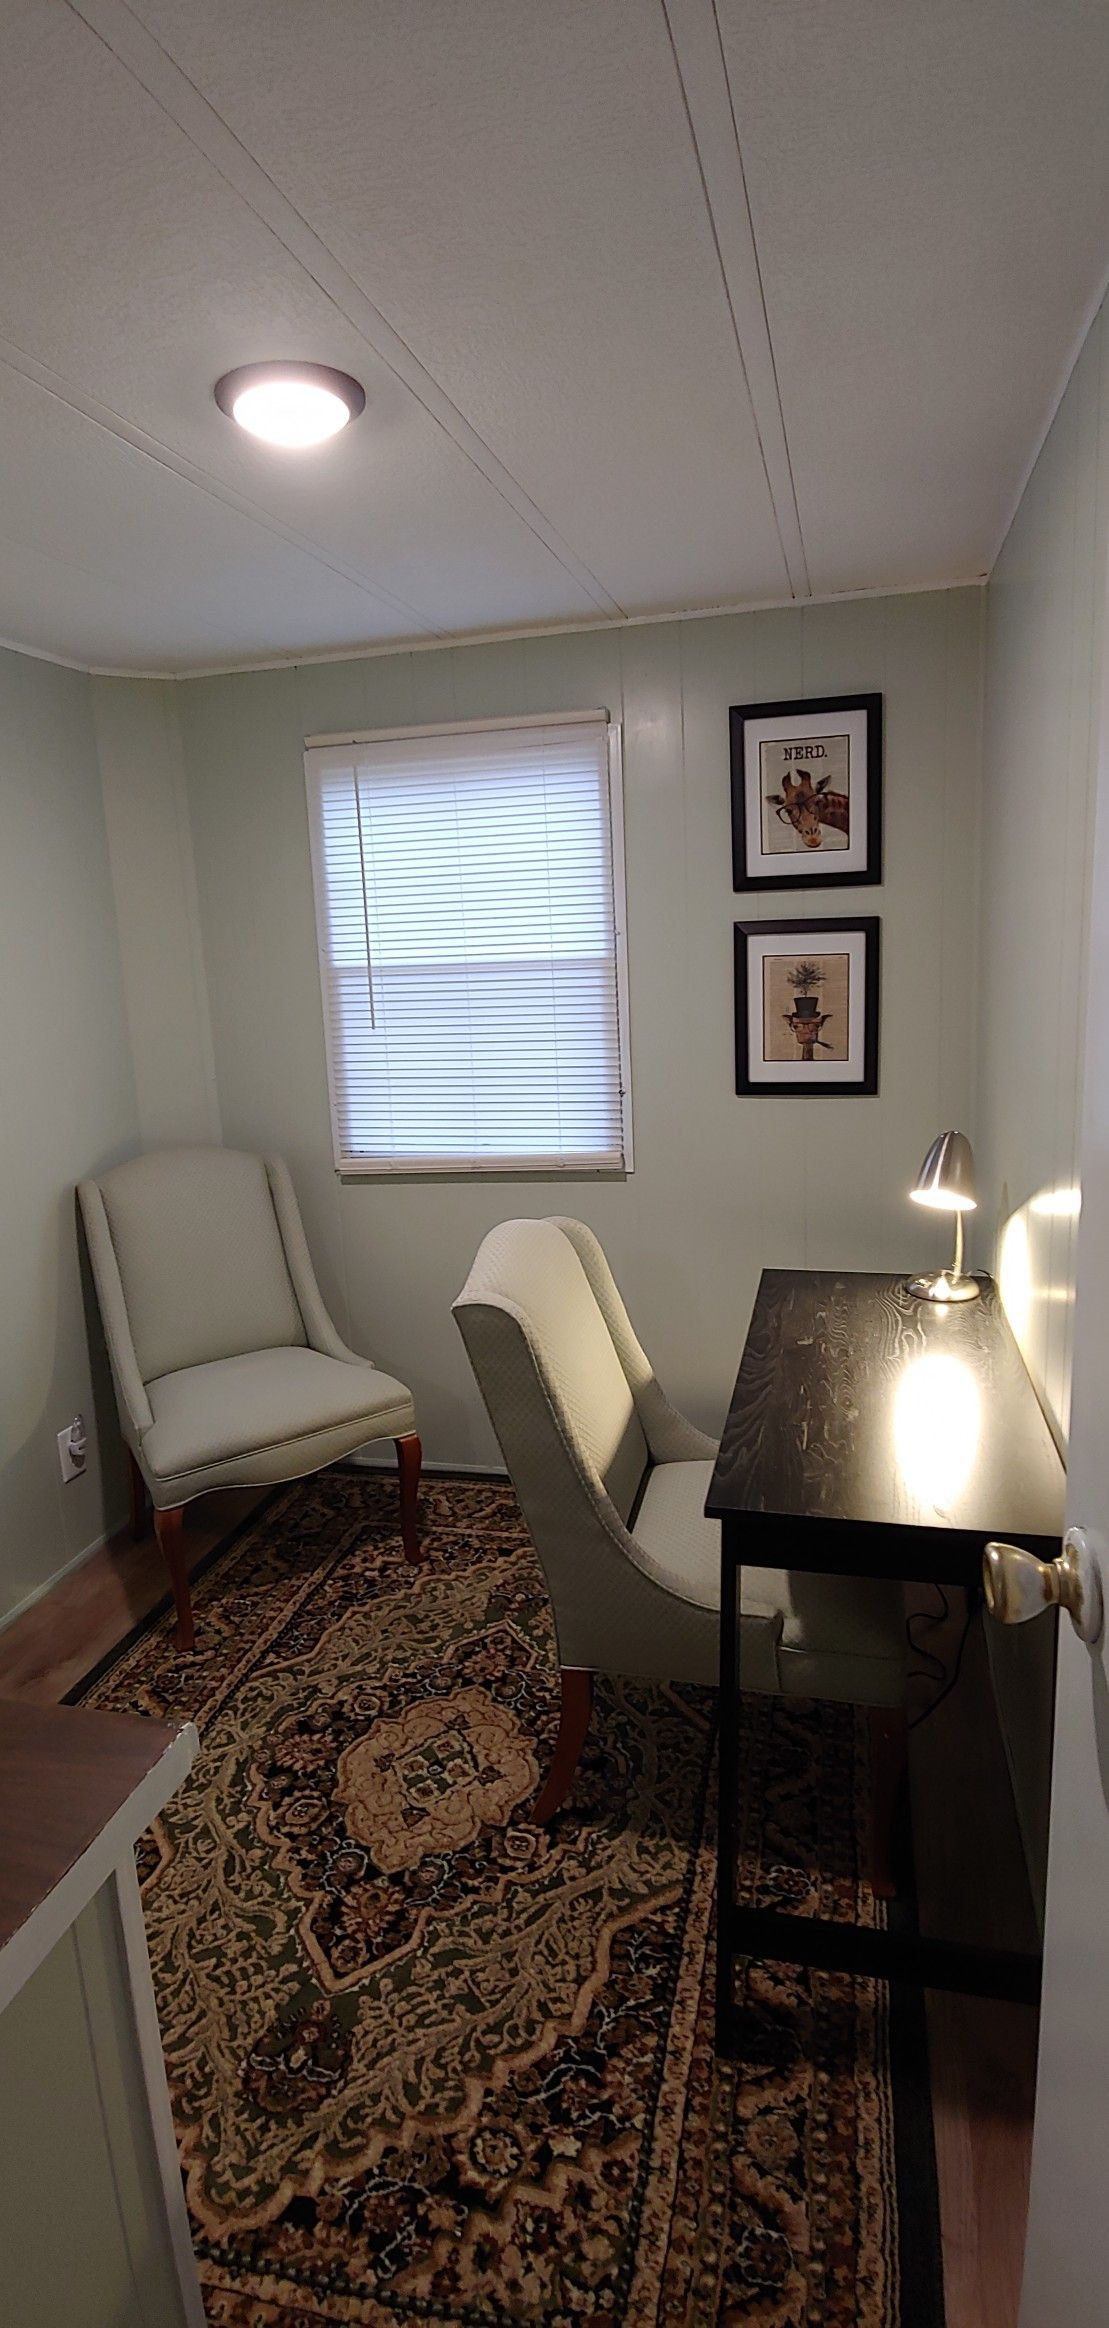 Receiving Room Interior Design: MANUFACTURED HOME DIY REMODEL